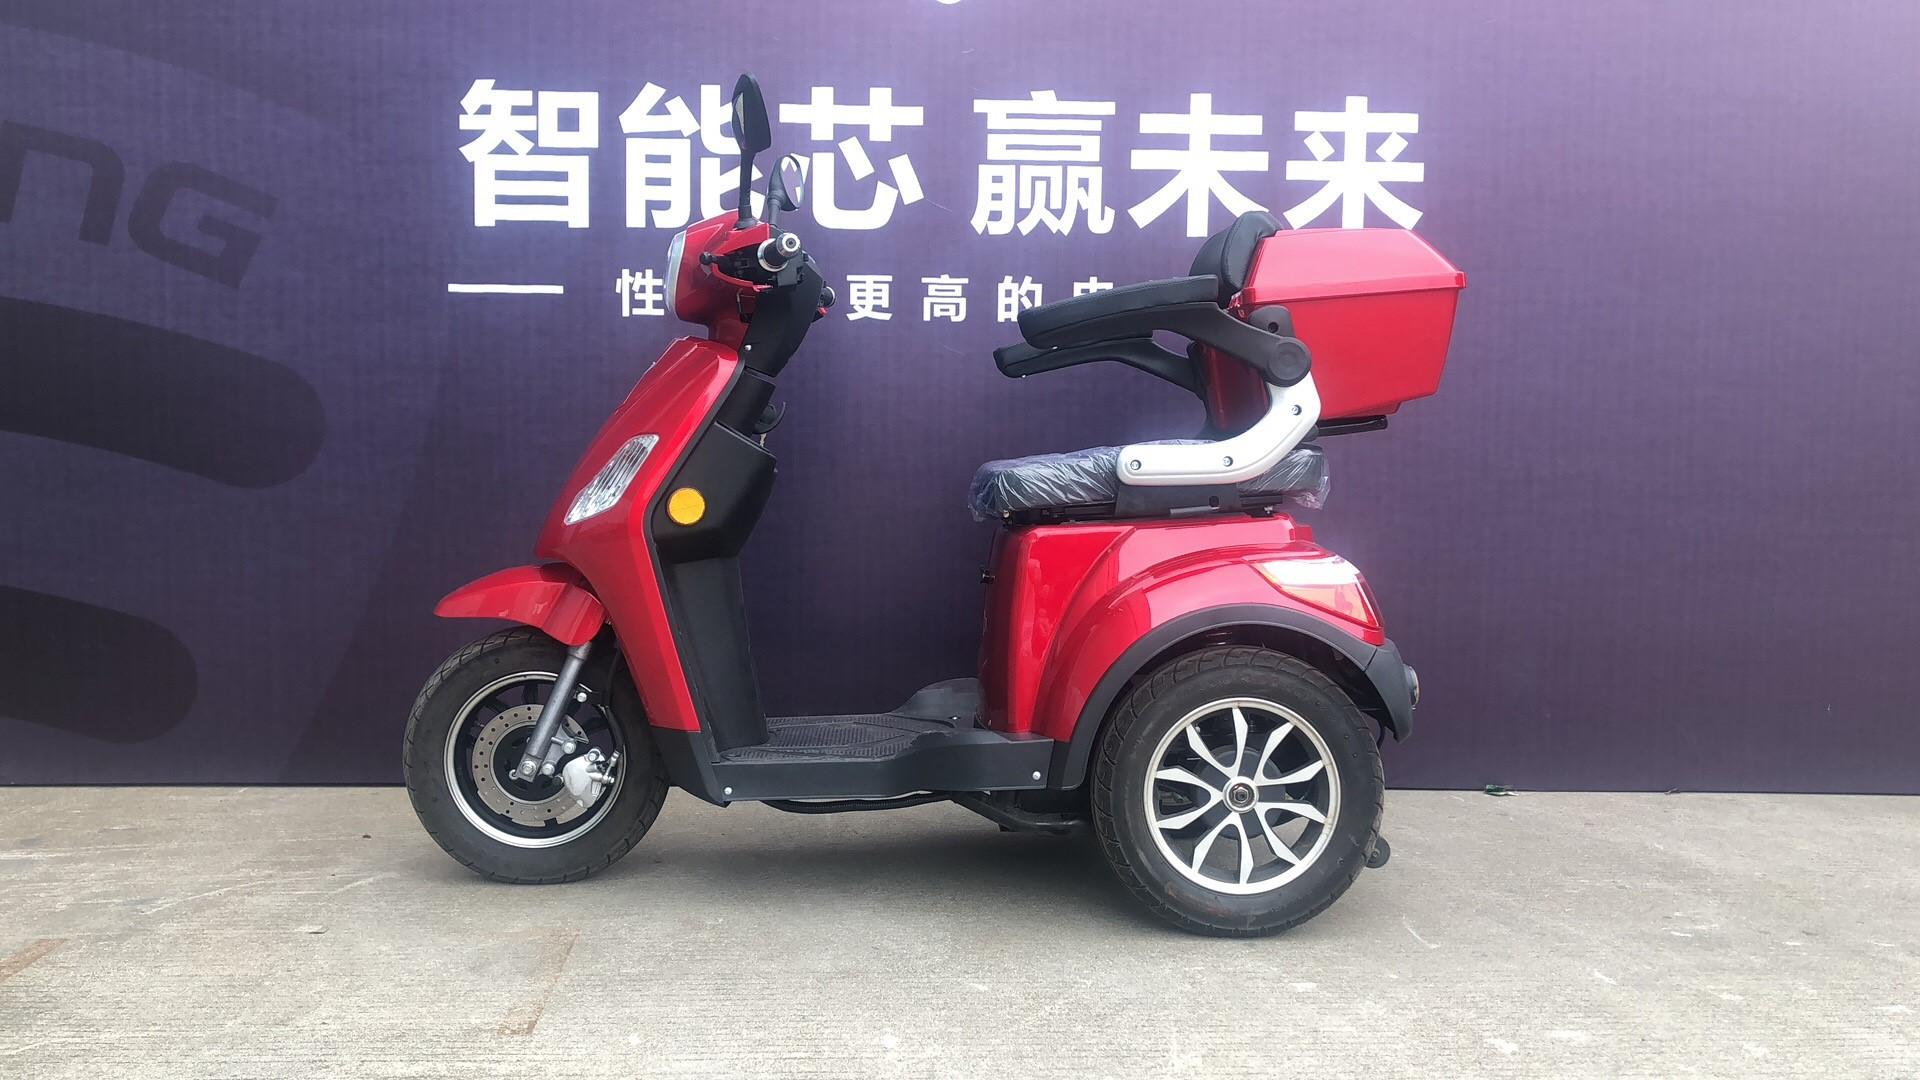 Koop Comfortabele E-driewieler. Comfortabele E-driewieler Prijzen. Comfortabele E-driewieler Brands. Comfortabele E-driewieler Fabrikant. Comfortabele E-driewieler Quotes. Comfortabele E-driewieler Company.